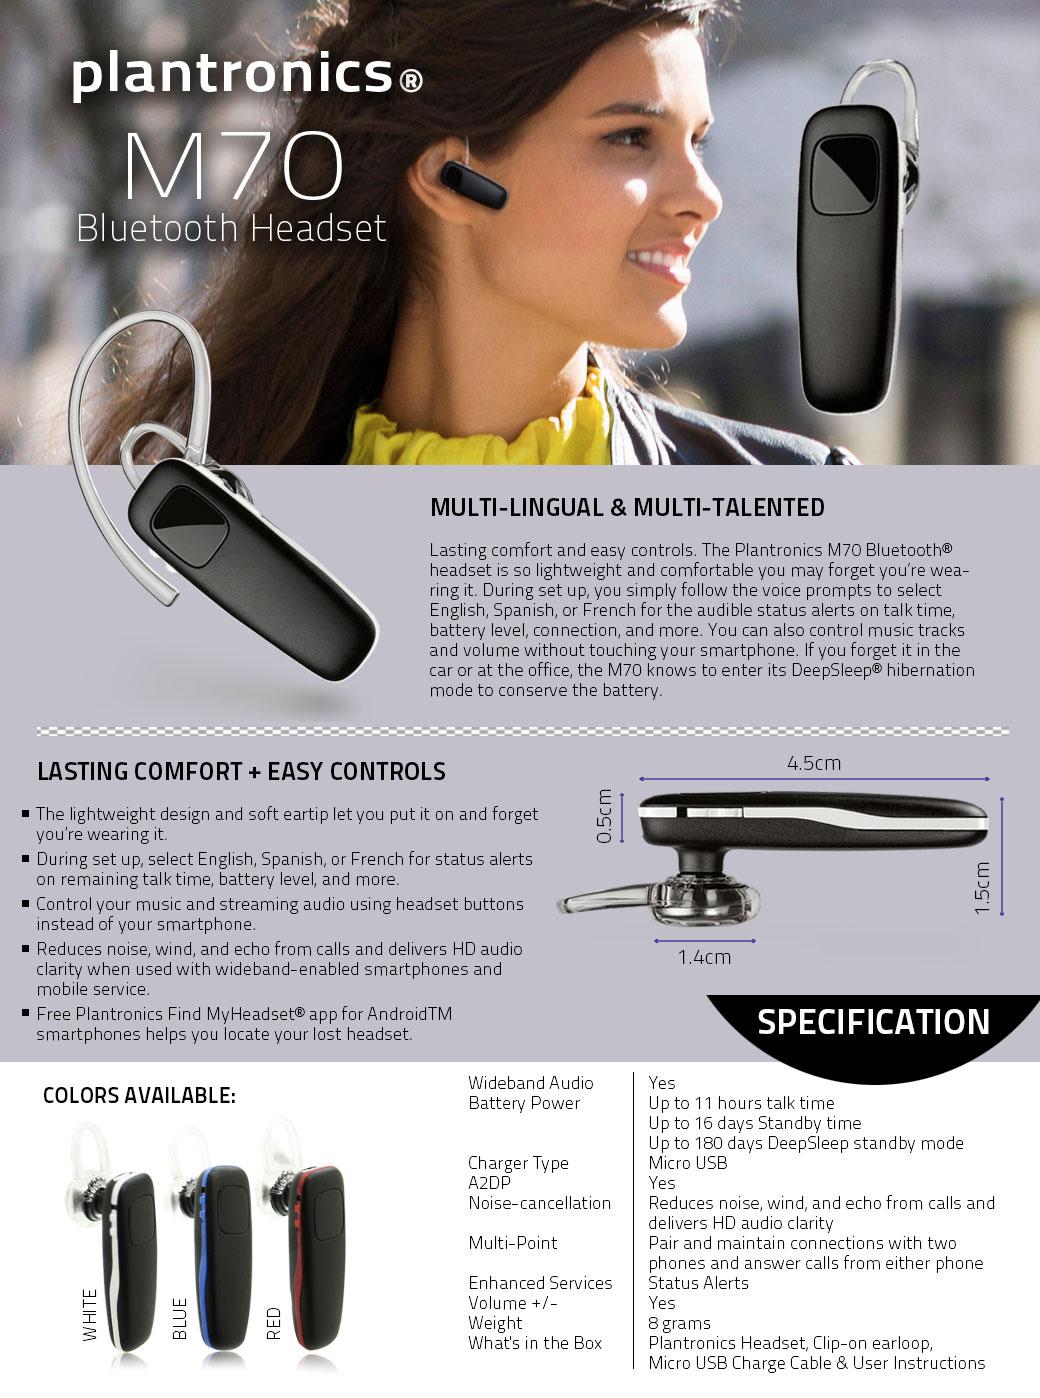 plantronics m70 light weight wireless bluetooth headset. Black Bedroom Furniture Sets. Home Design Ideas